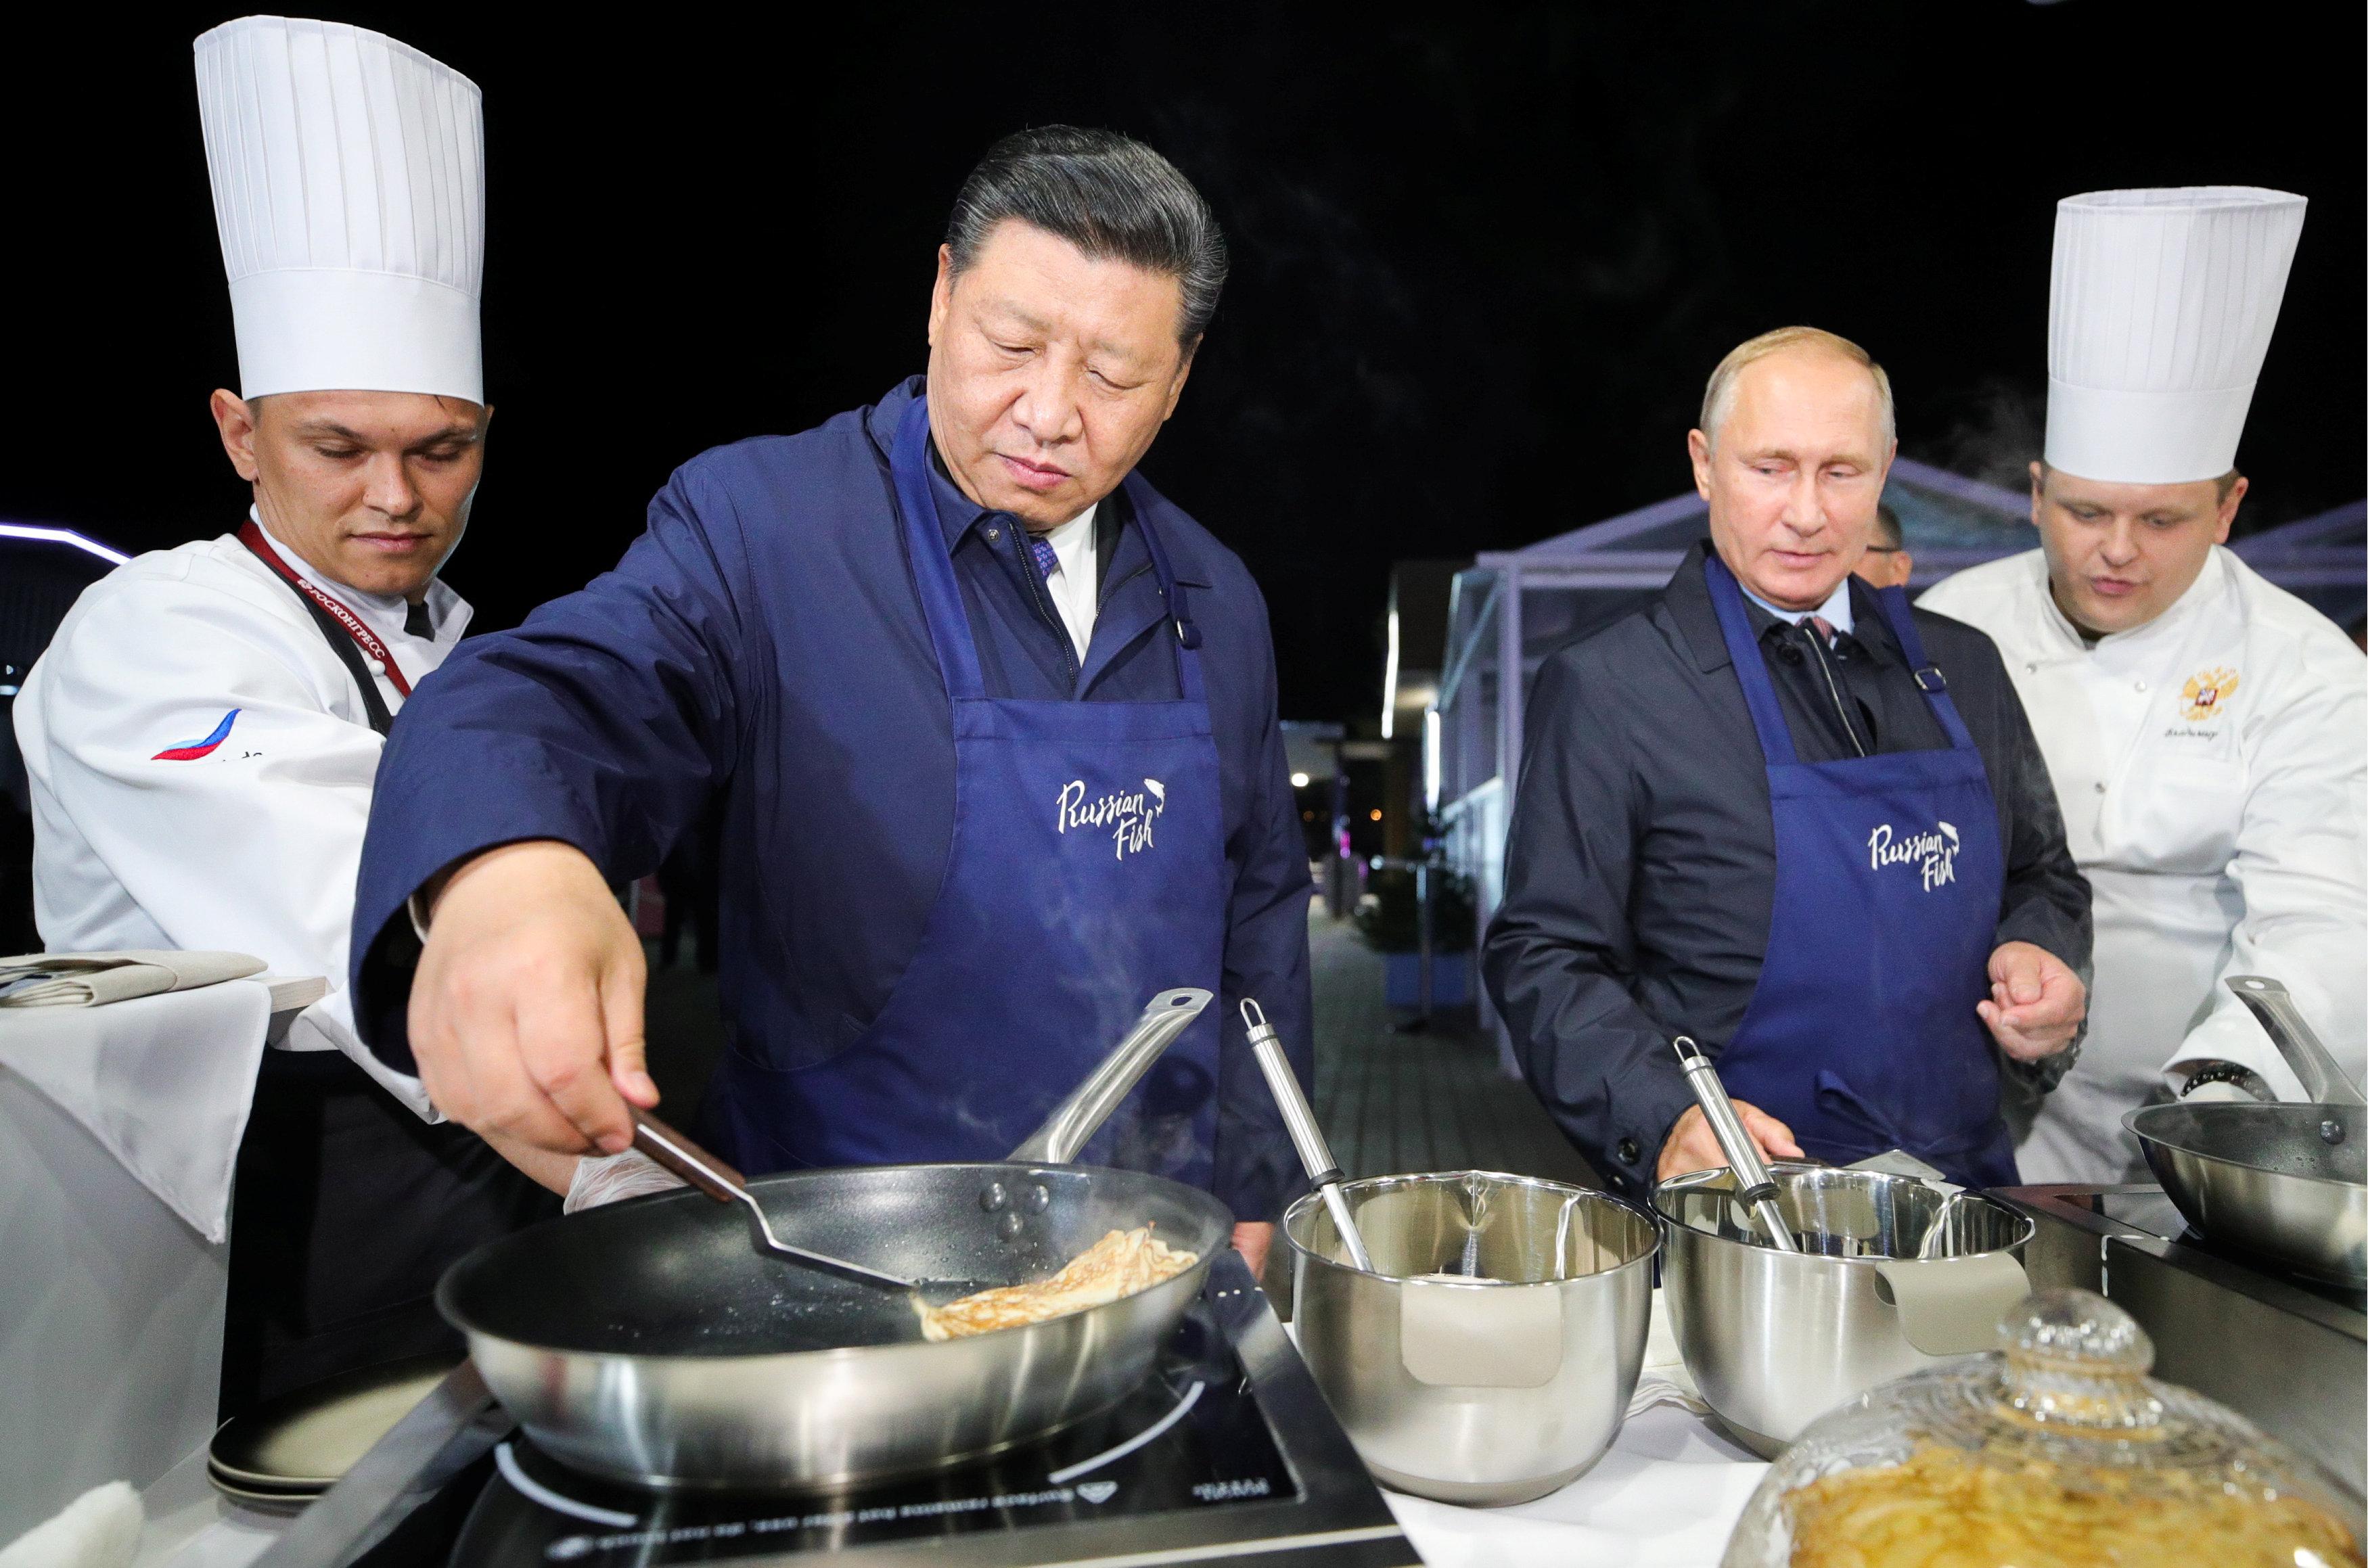 بوتين وشى يعدان الفطائر